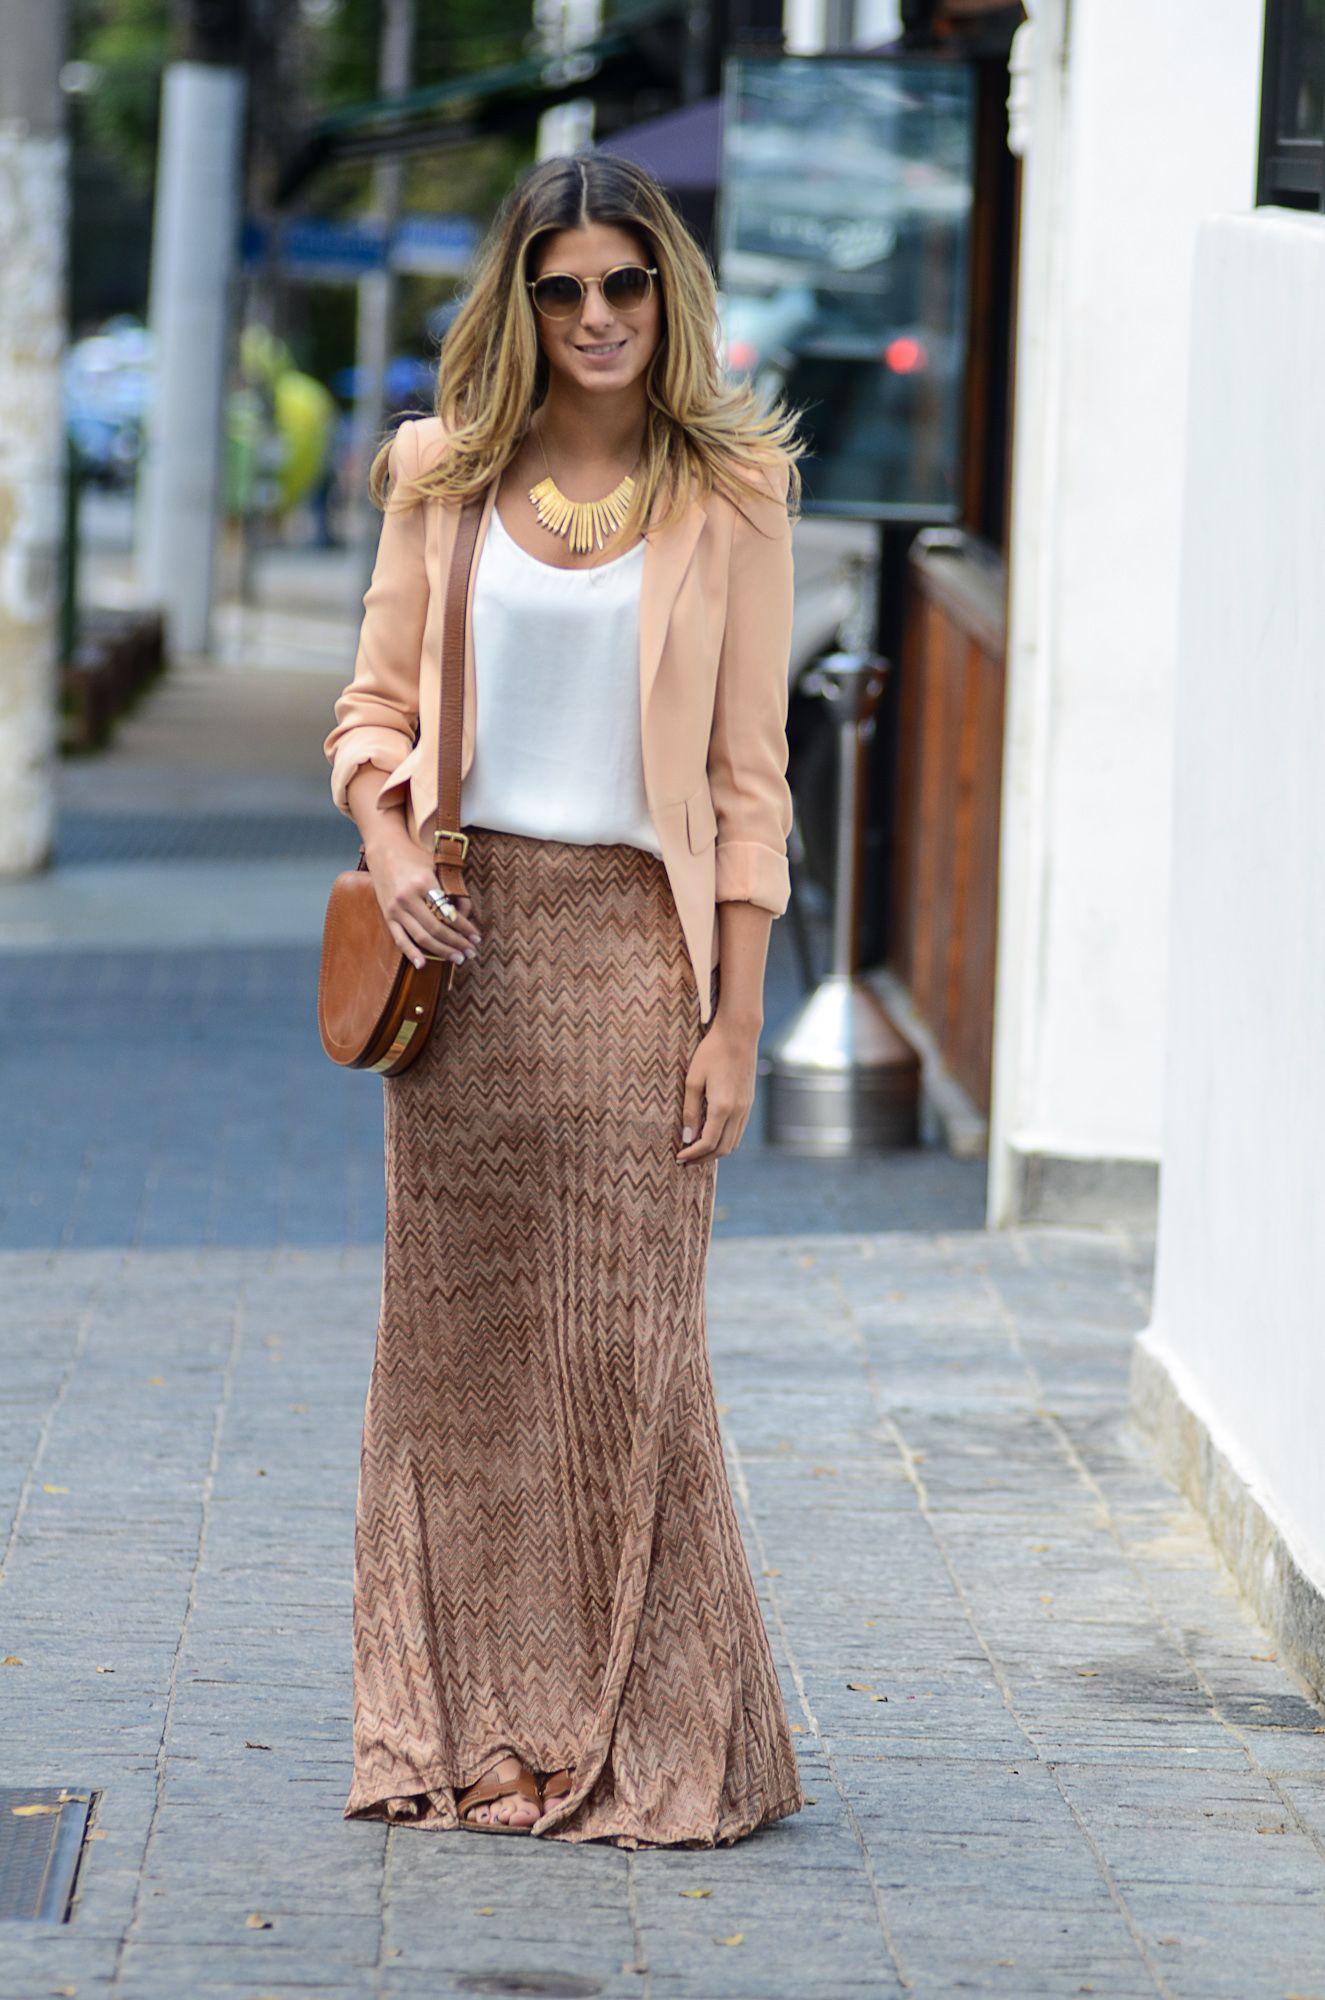 Anna Fasano - Women´s Fashion Style Casual Inspiring Look Outfit - Moda  Feminina Estilo Inspiração ba40ddf470